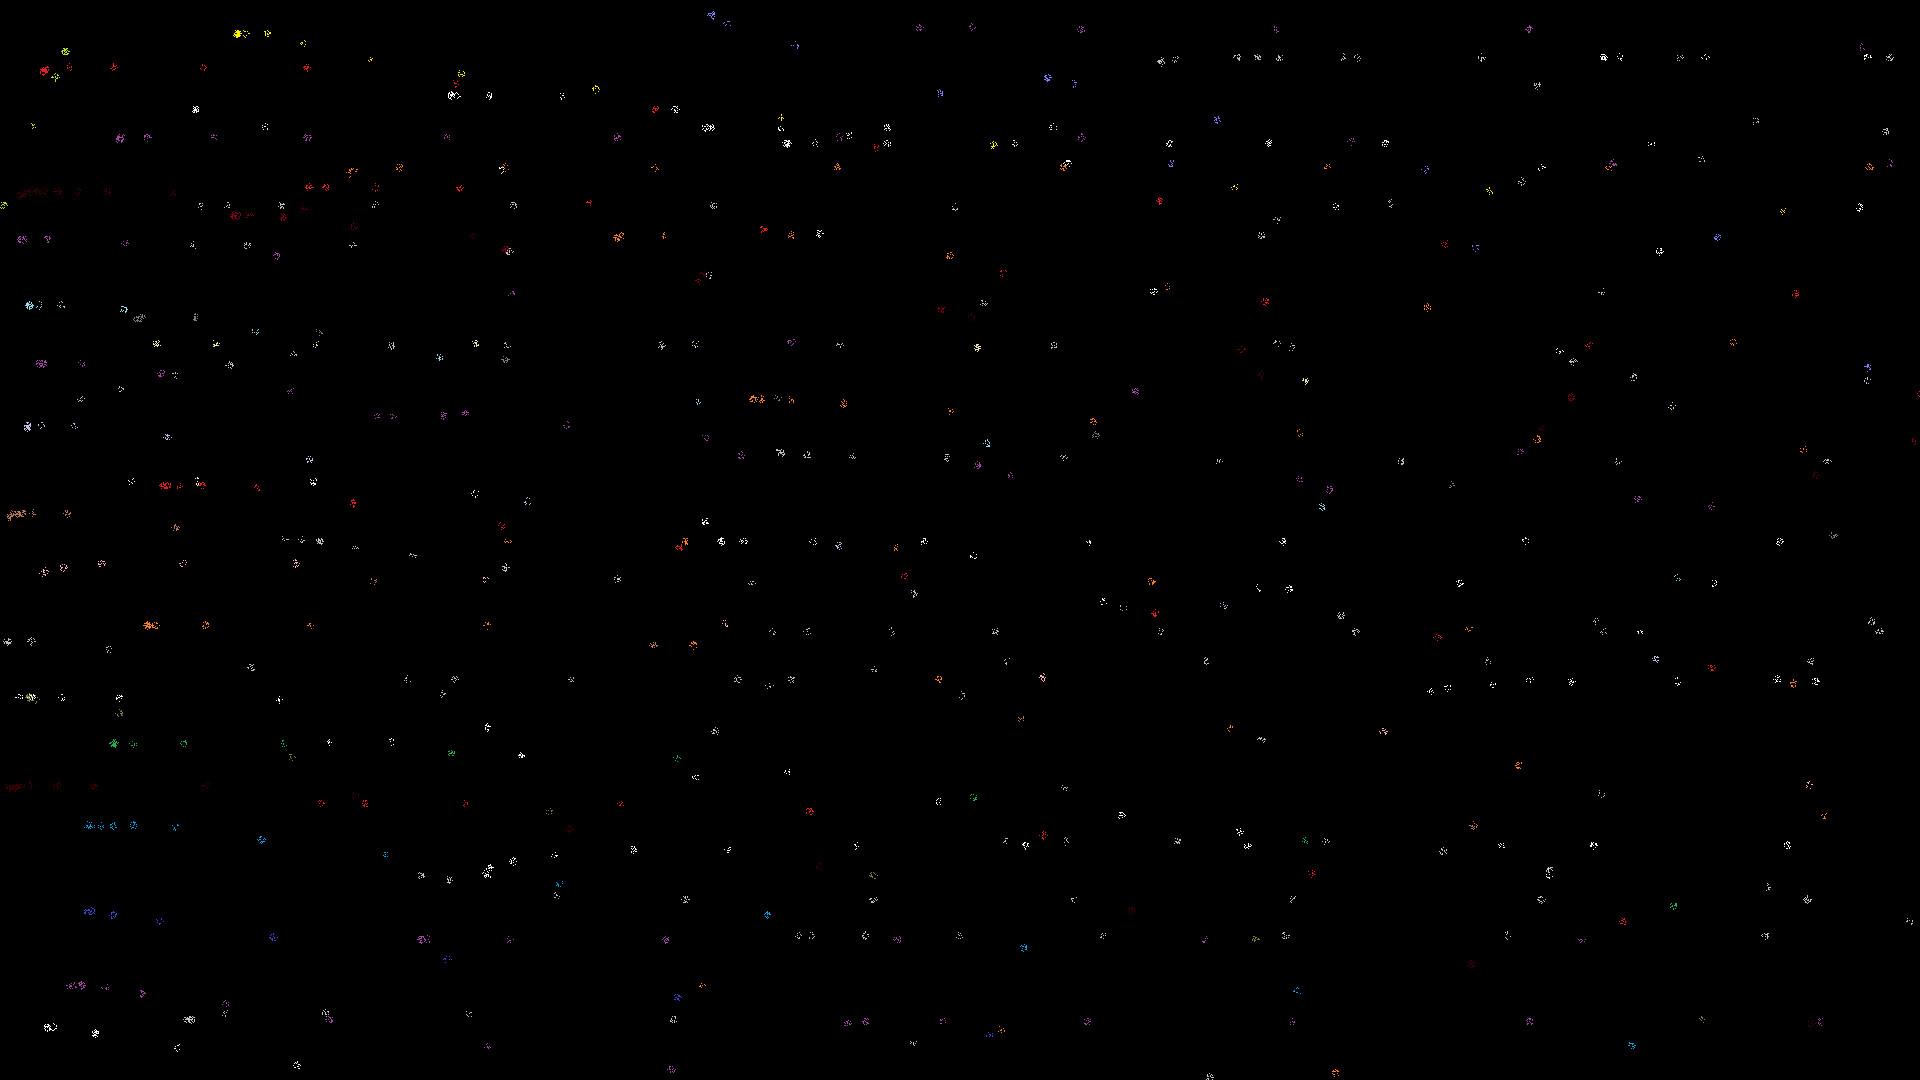 Sky effect black wallpaper